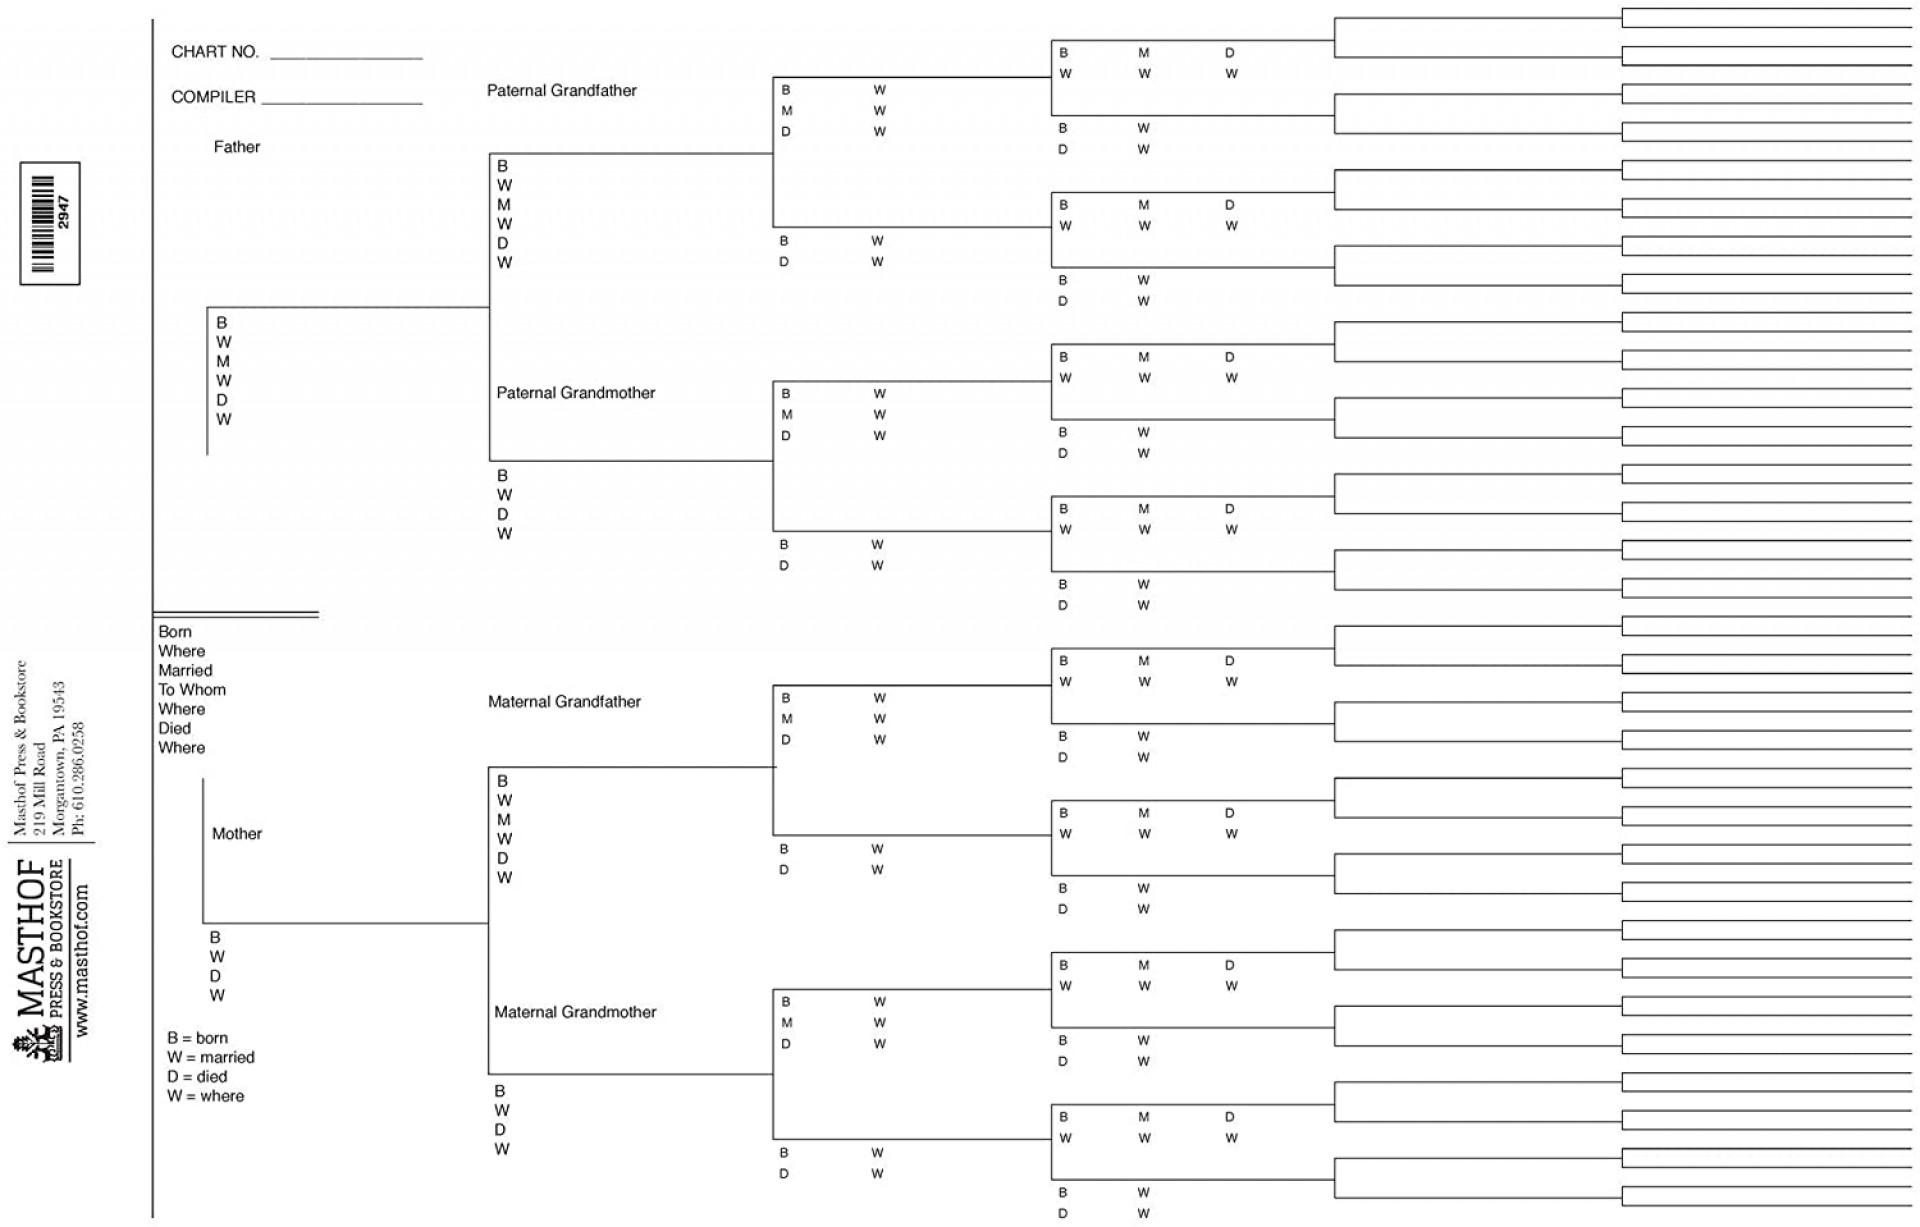 004 Stunning 7 Generation Family Tree Template High Def  Blank Free Editable1920